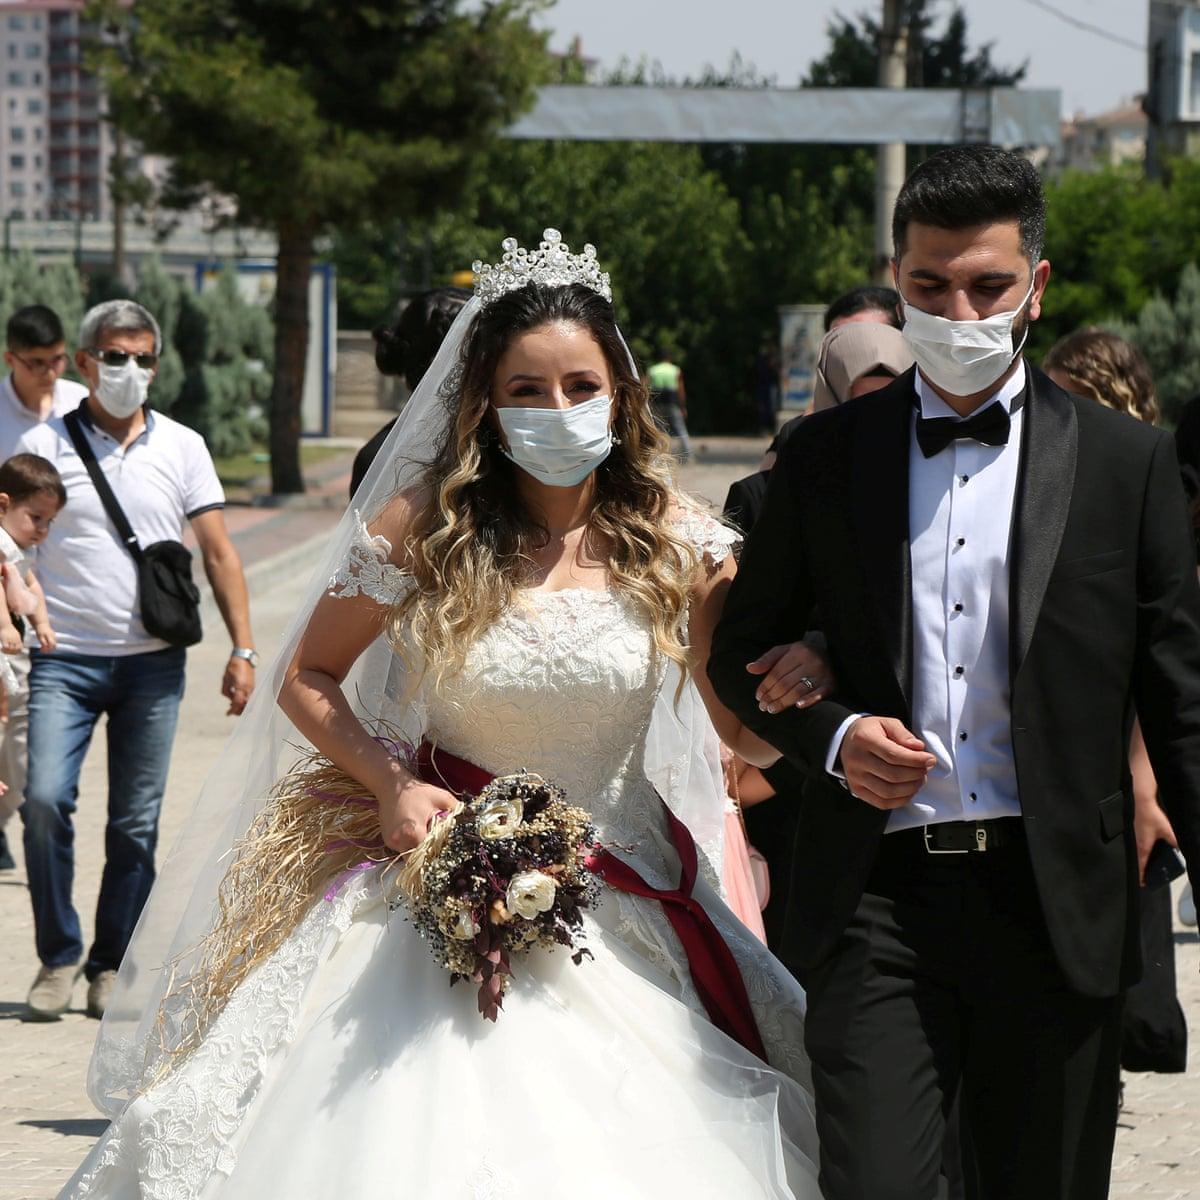 Coronavirus rise dashes Turkish dreams of big weddings | World news | The Guardian